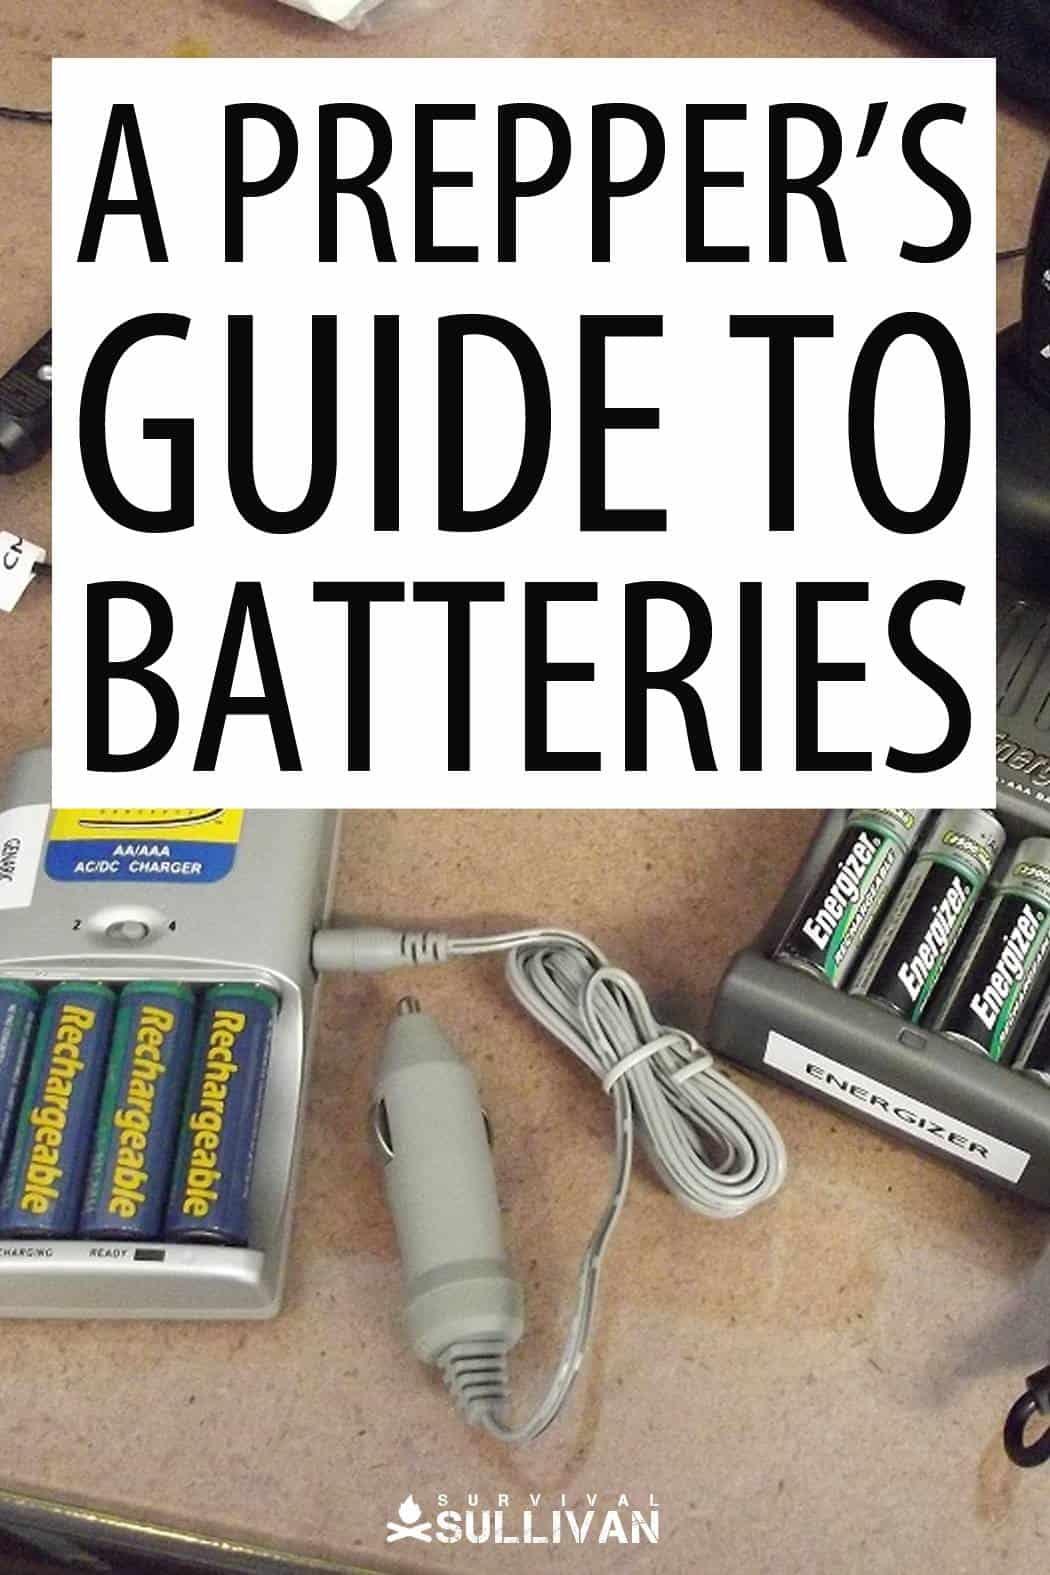 prepper batteries Pinterest image